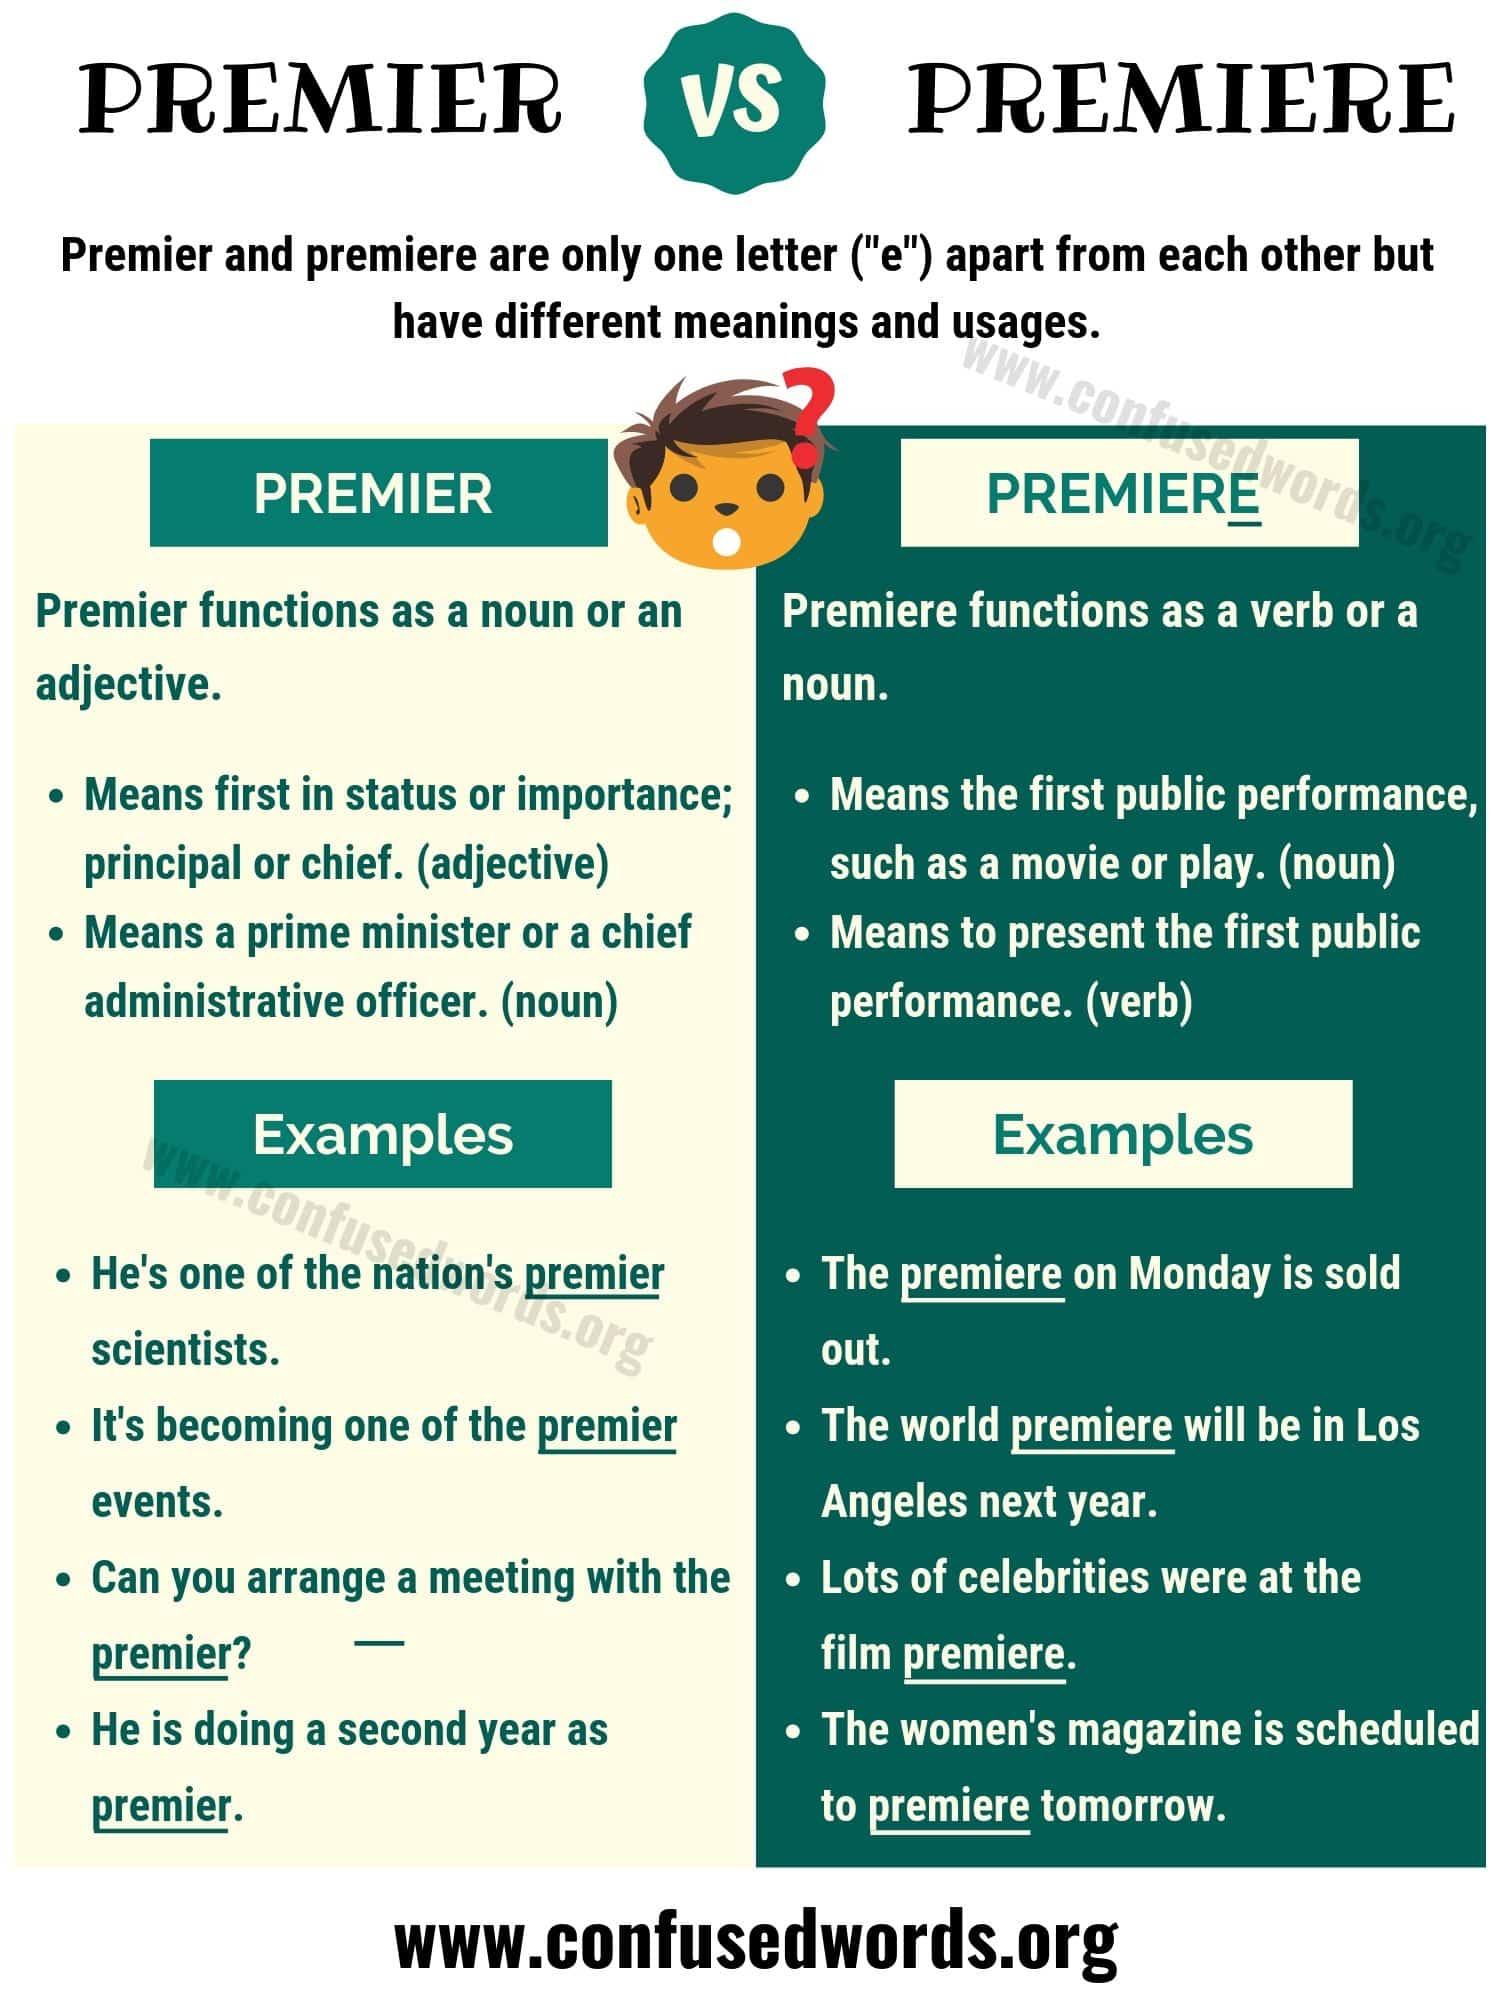 Premier vs Premiere